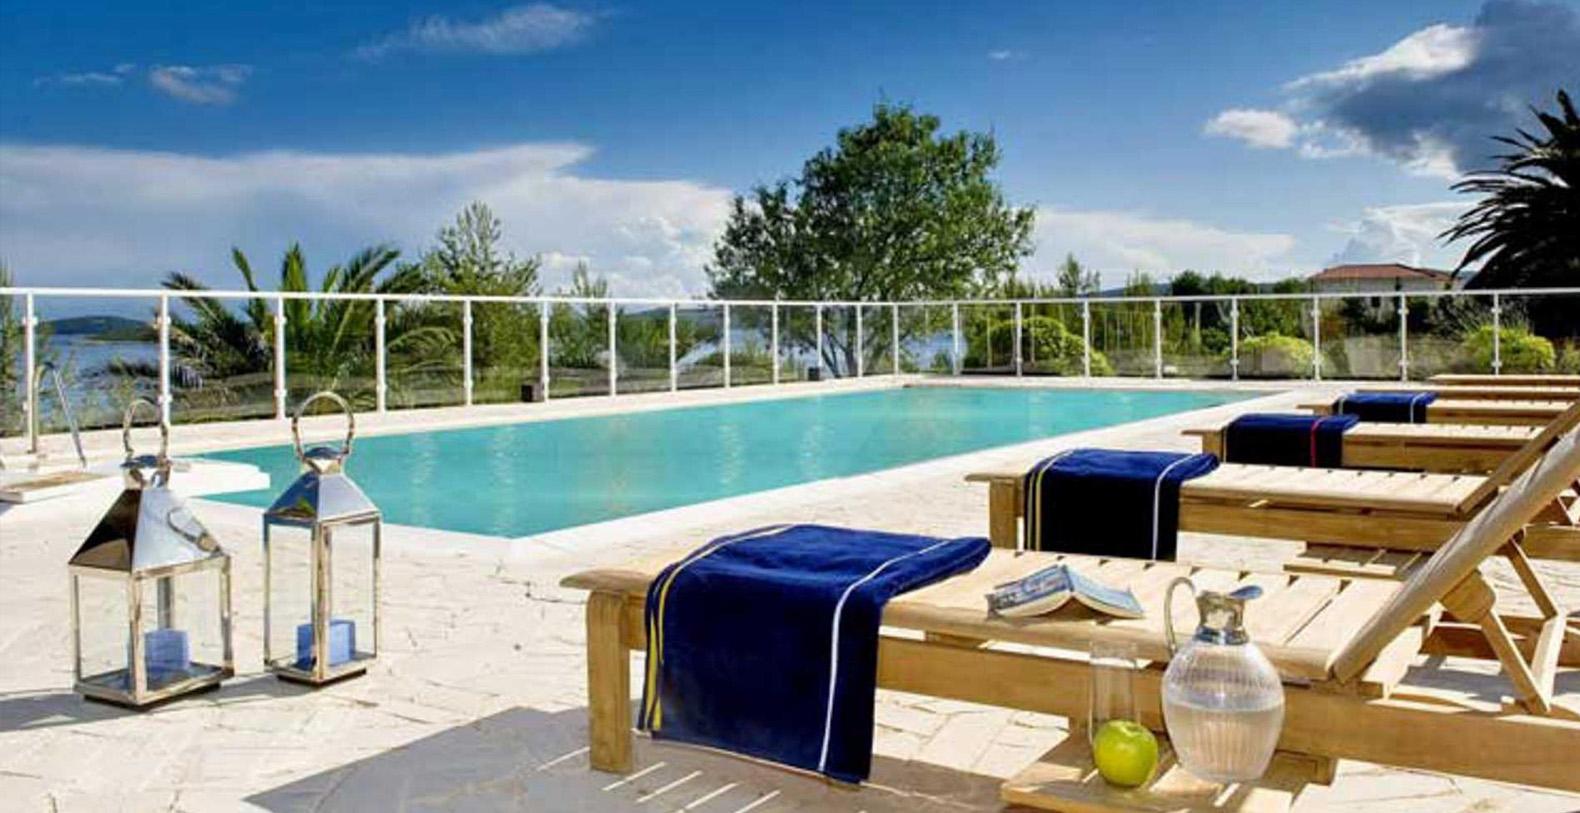 Croatia Holiday Rental Homes, Croatia Vacation Villas